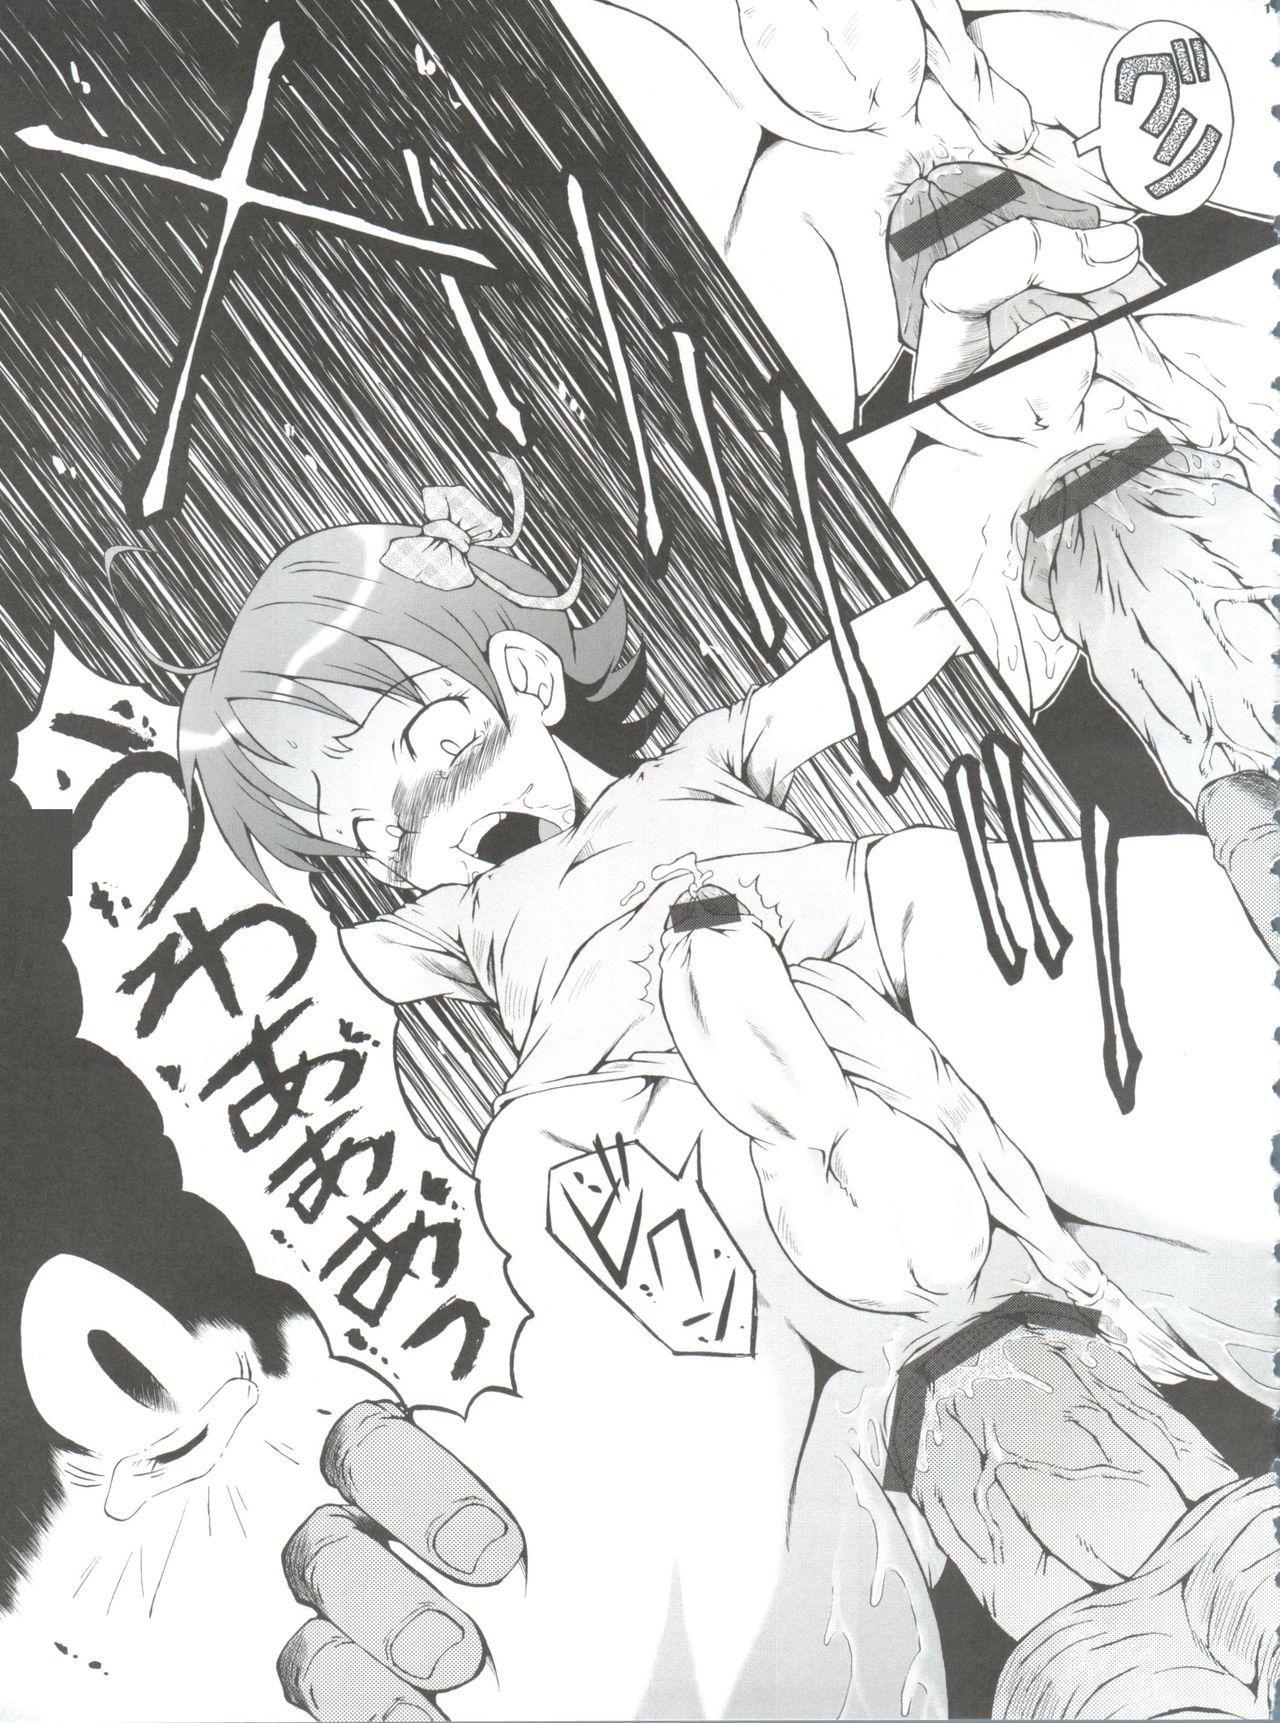 Urabambi Vol. 26 9